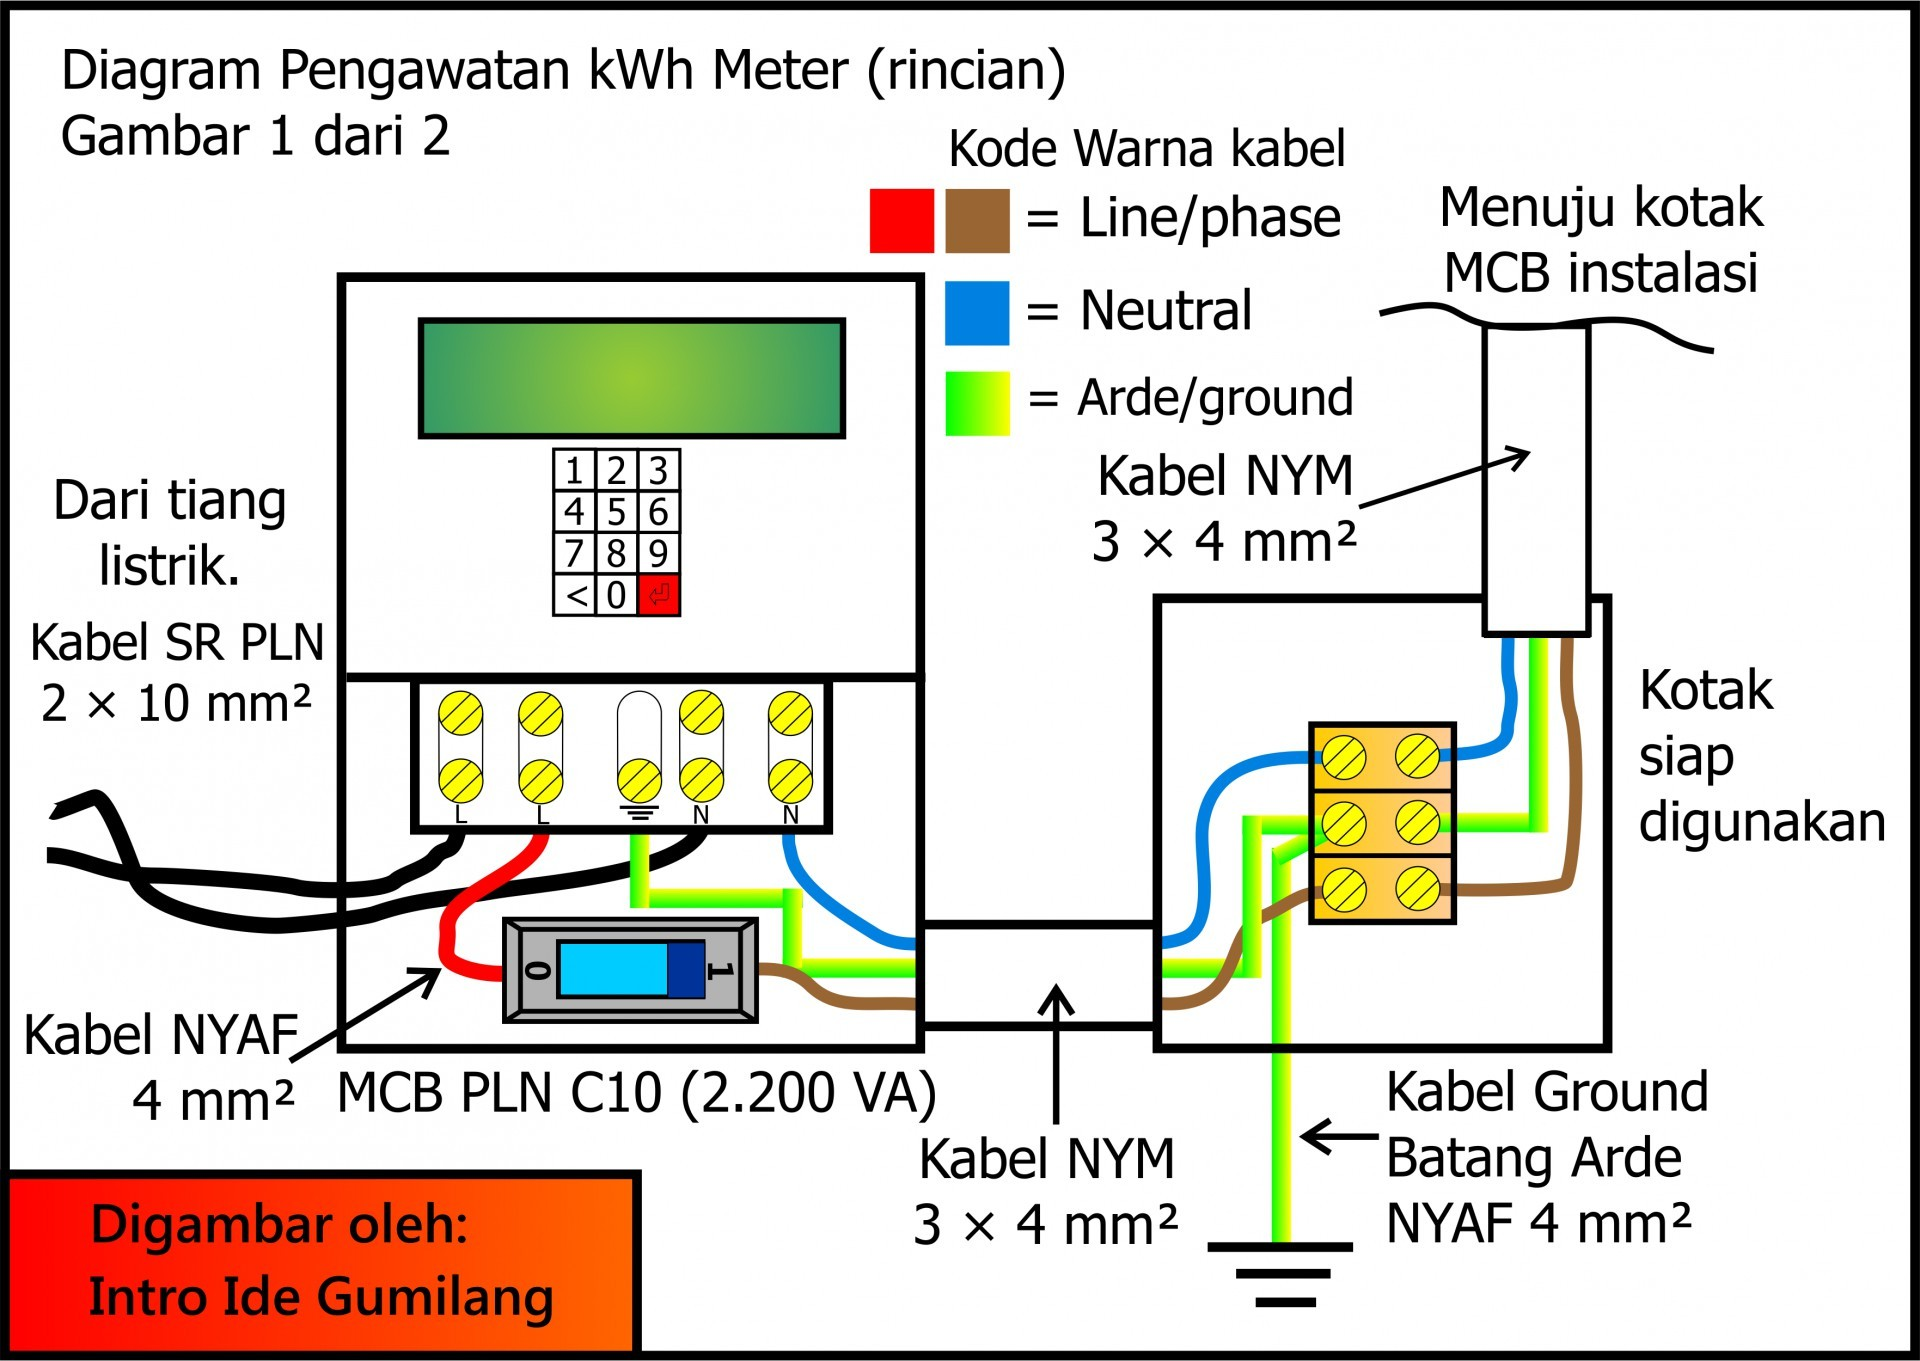 200 Amp Meter Base Wiring Diagram Luxury Fantastic Kwh Meter Wiring Diagram S Electrical Wiring